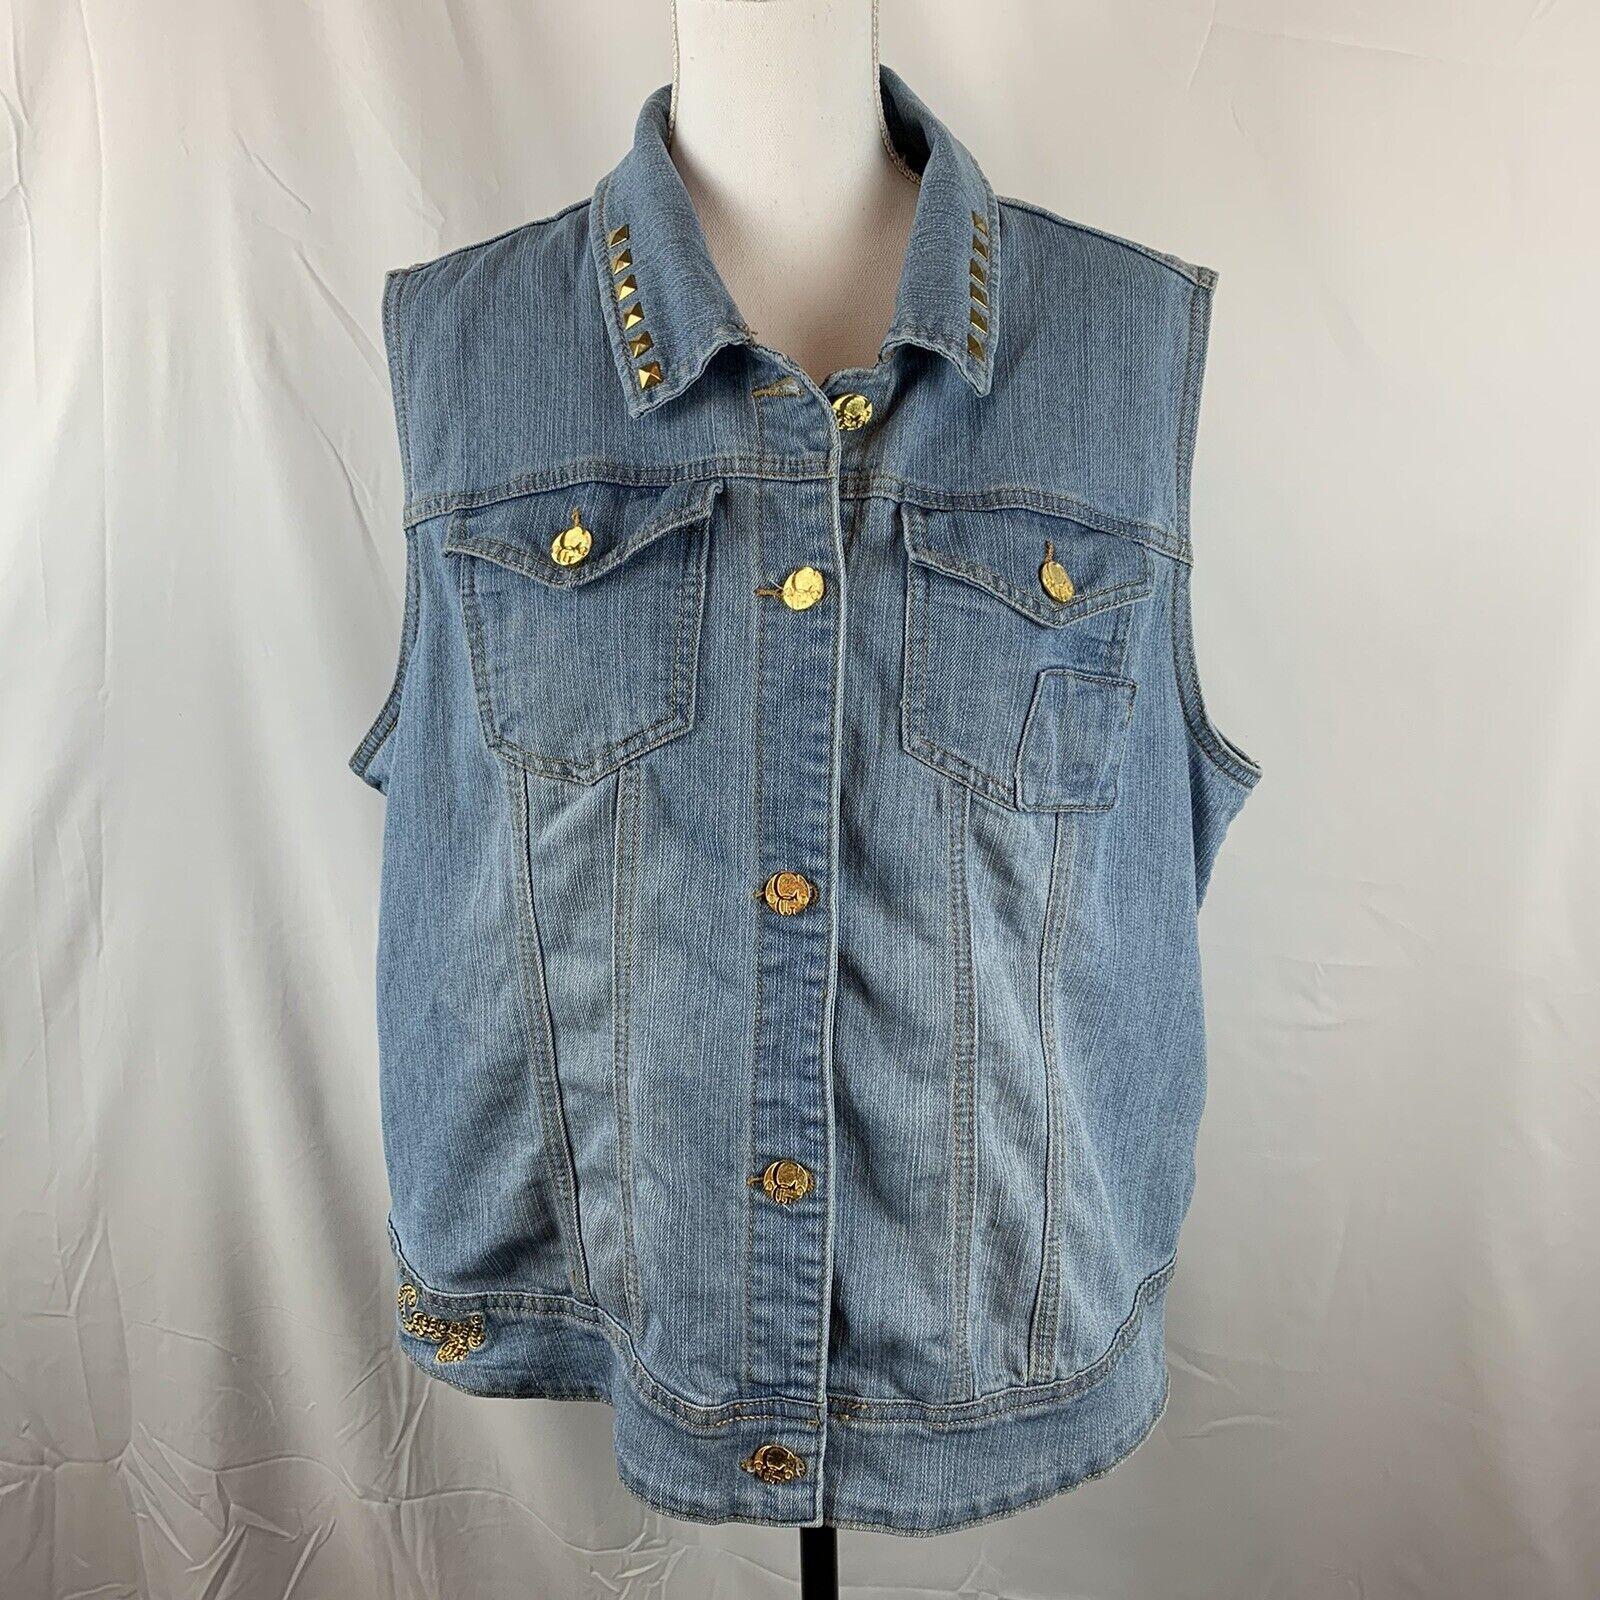 Coogi Womens Denim Vest 2X Blue Gold Tone Buttons Studs Pockets